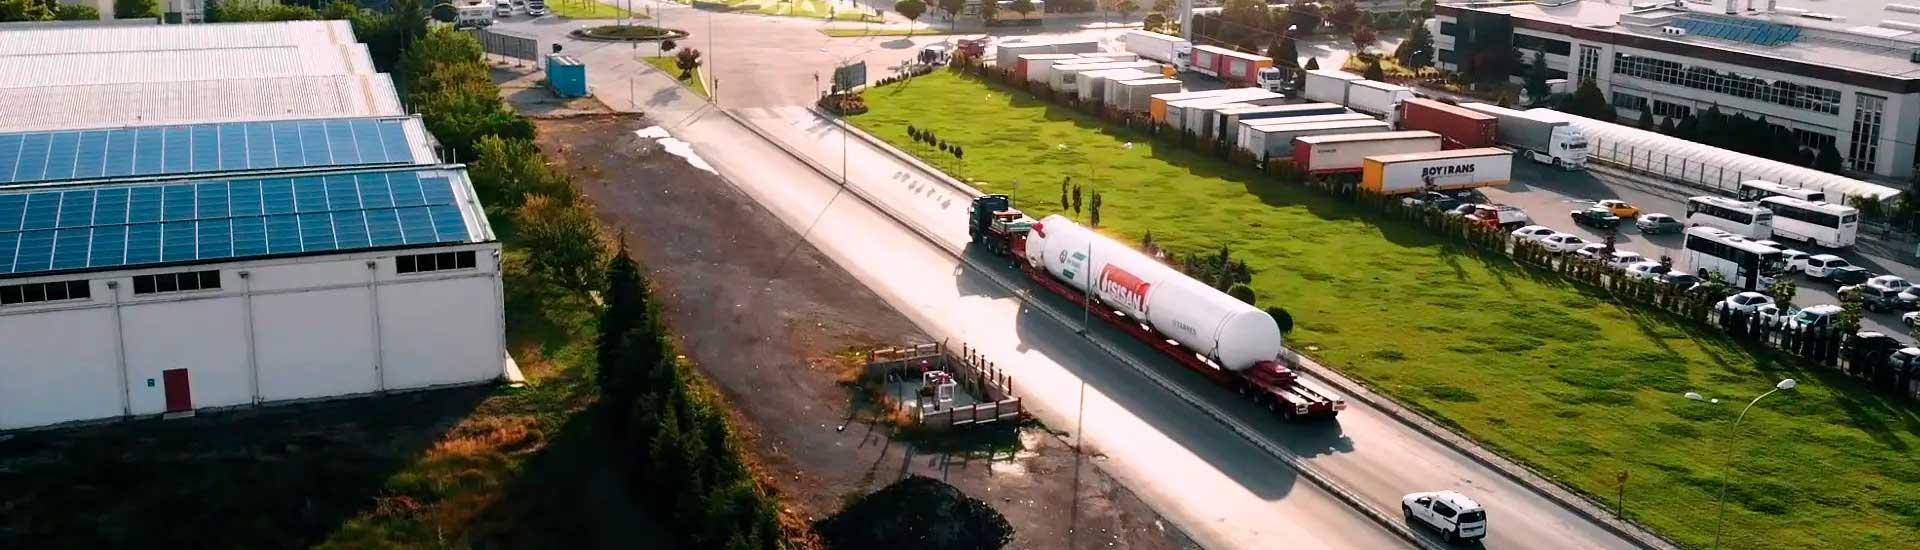 Yarres-Logistics-video-bilder